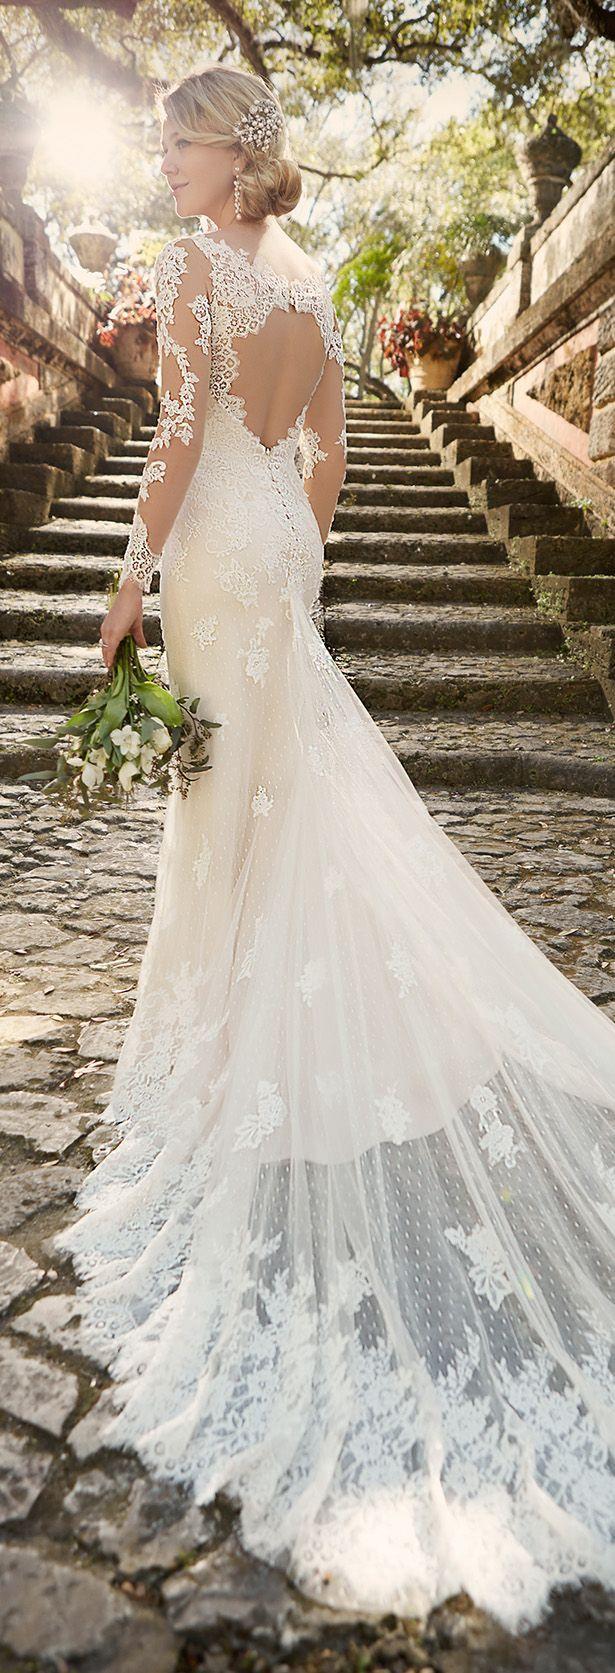 Christmas wedding dress korean - Best 10 Winter Wedding Dresses Ideas On Pinterest Wedding Gowns For Winter Winter Wedding Dresses 2016 And Lace Long Dresses